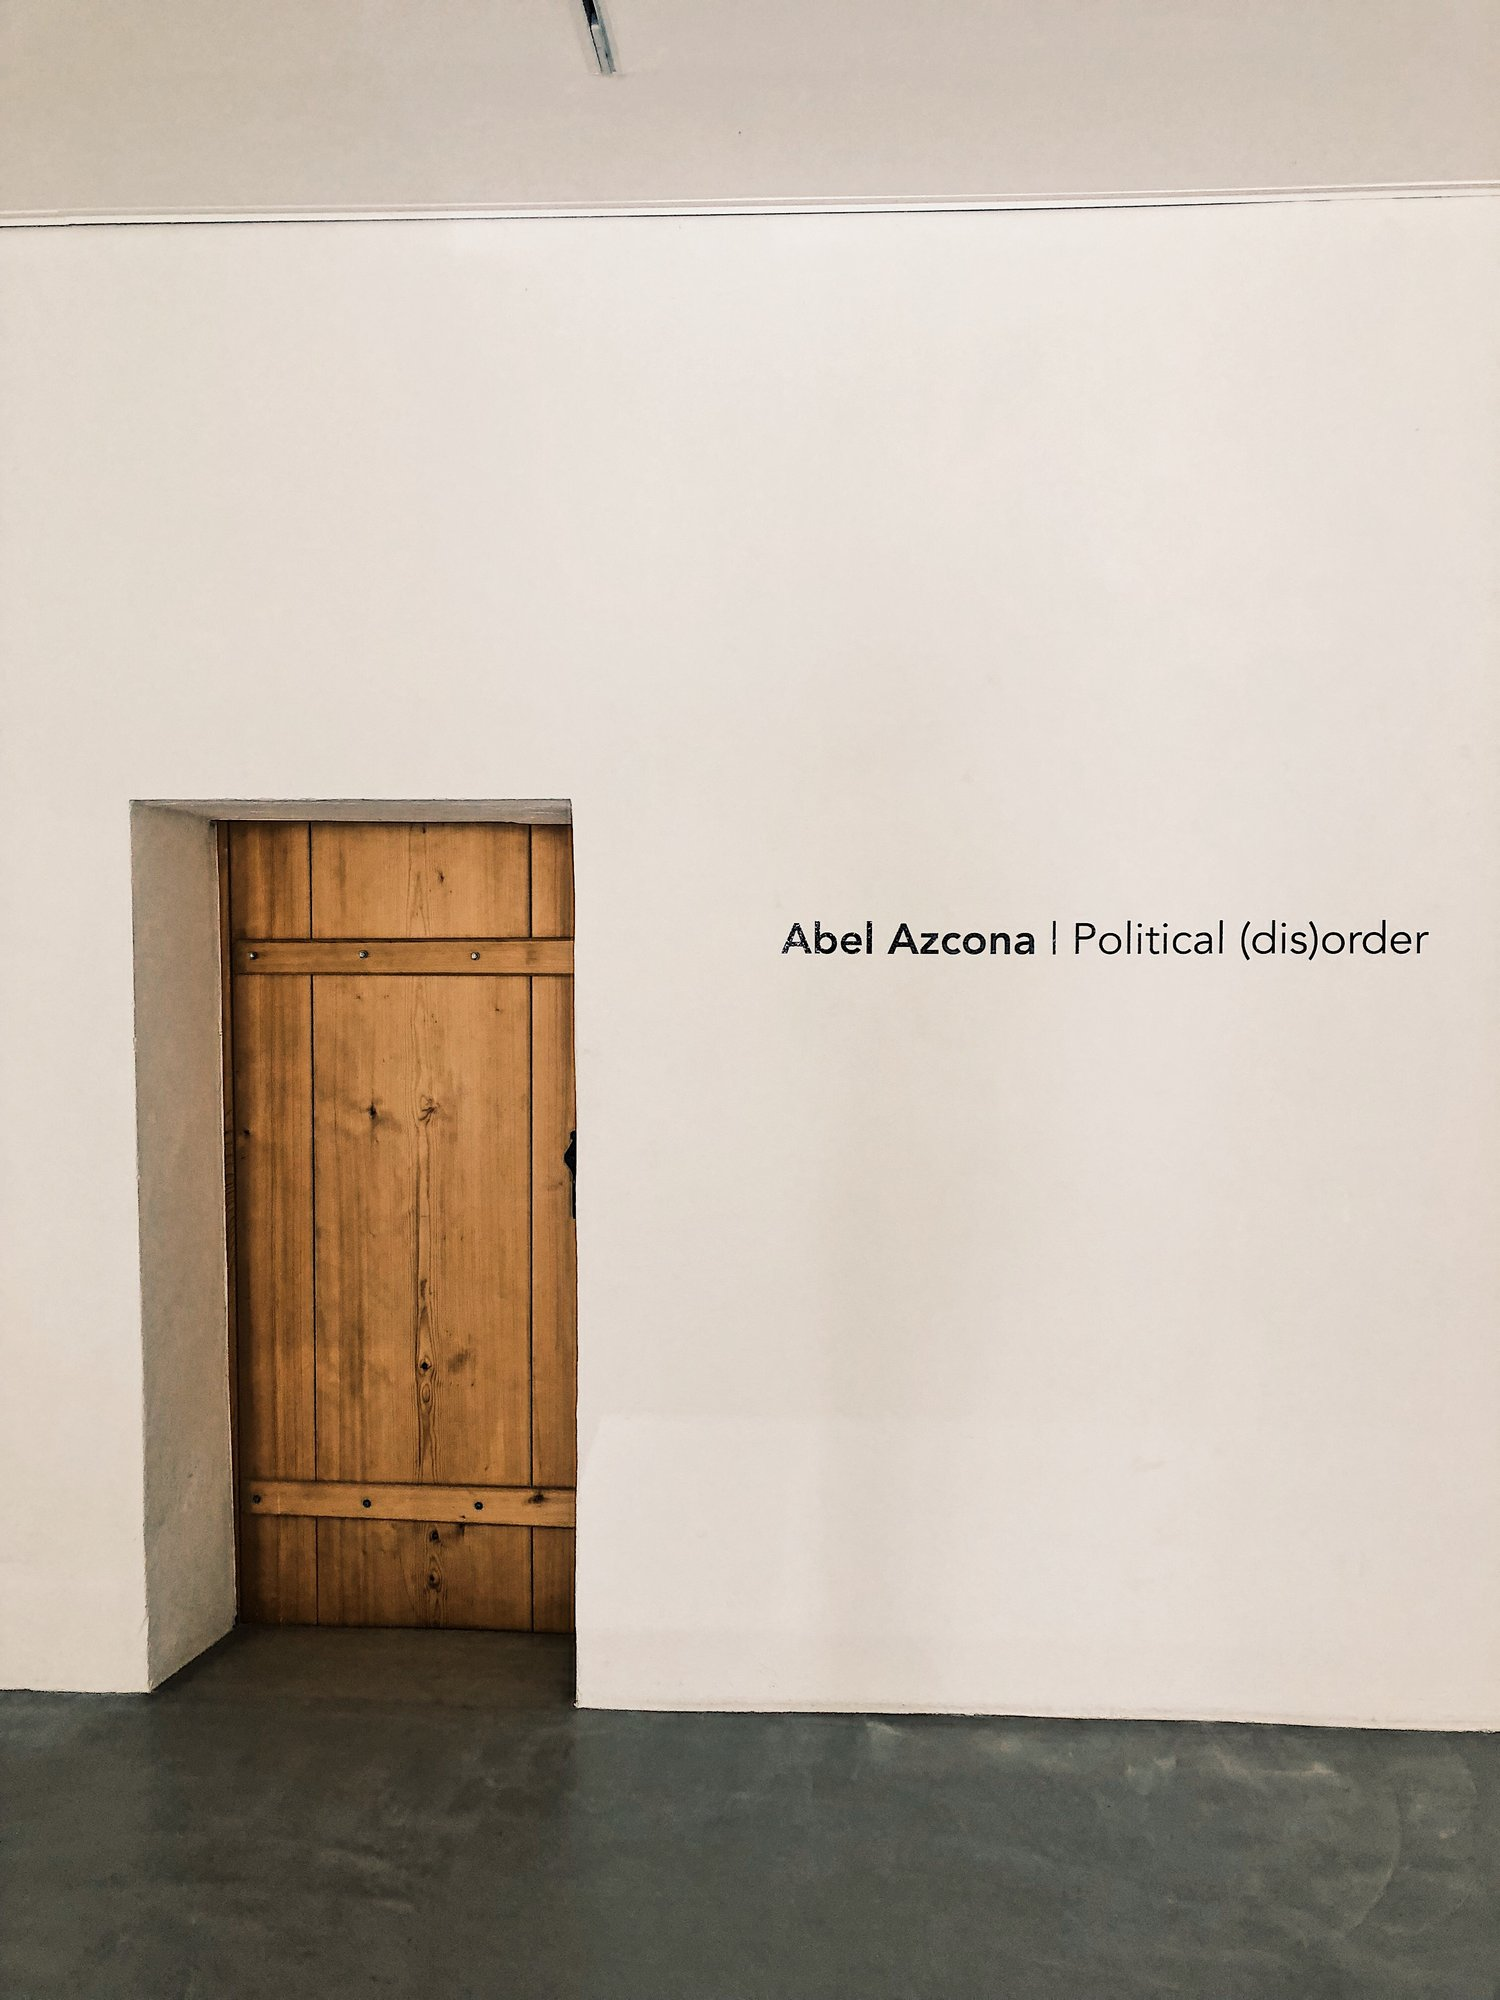 Fotografía compartida en redes sociales por Abel Azcona  horas antes de inaugurar Political (dis)order  en Espace dAm.